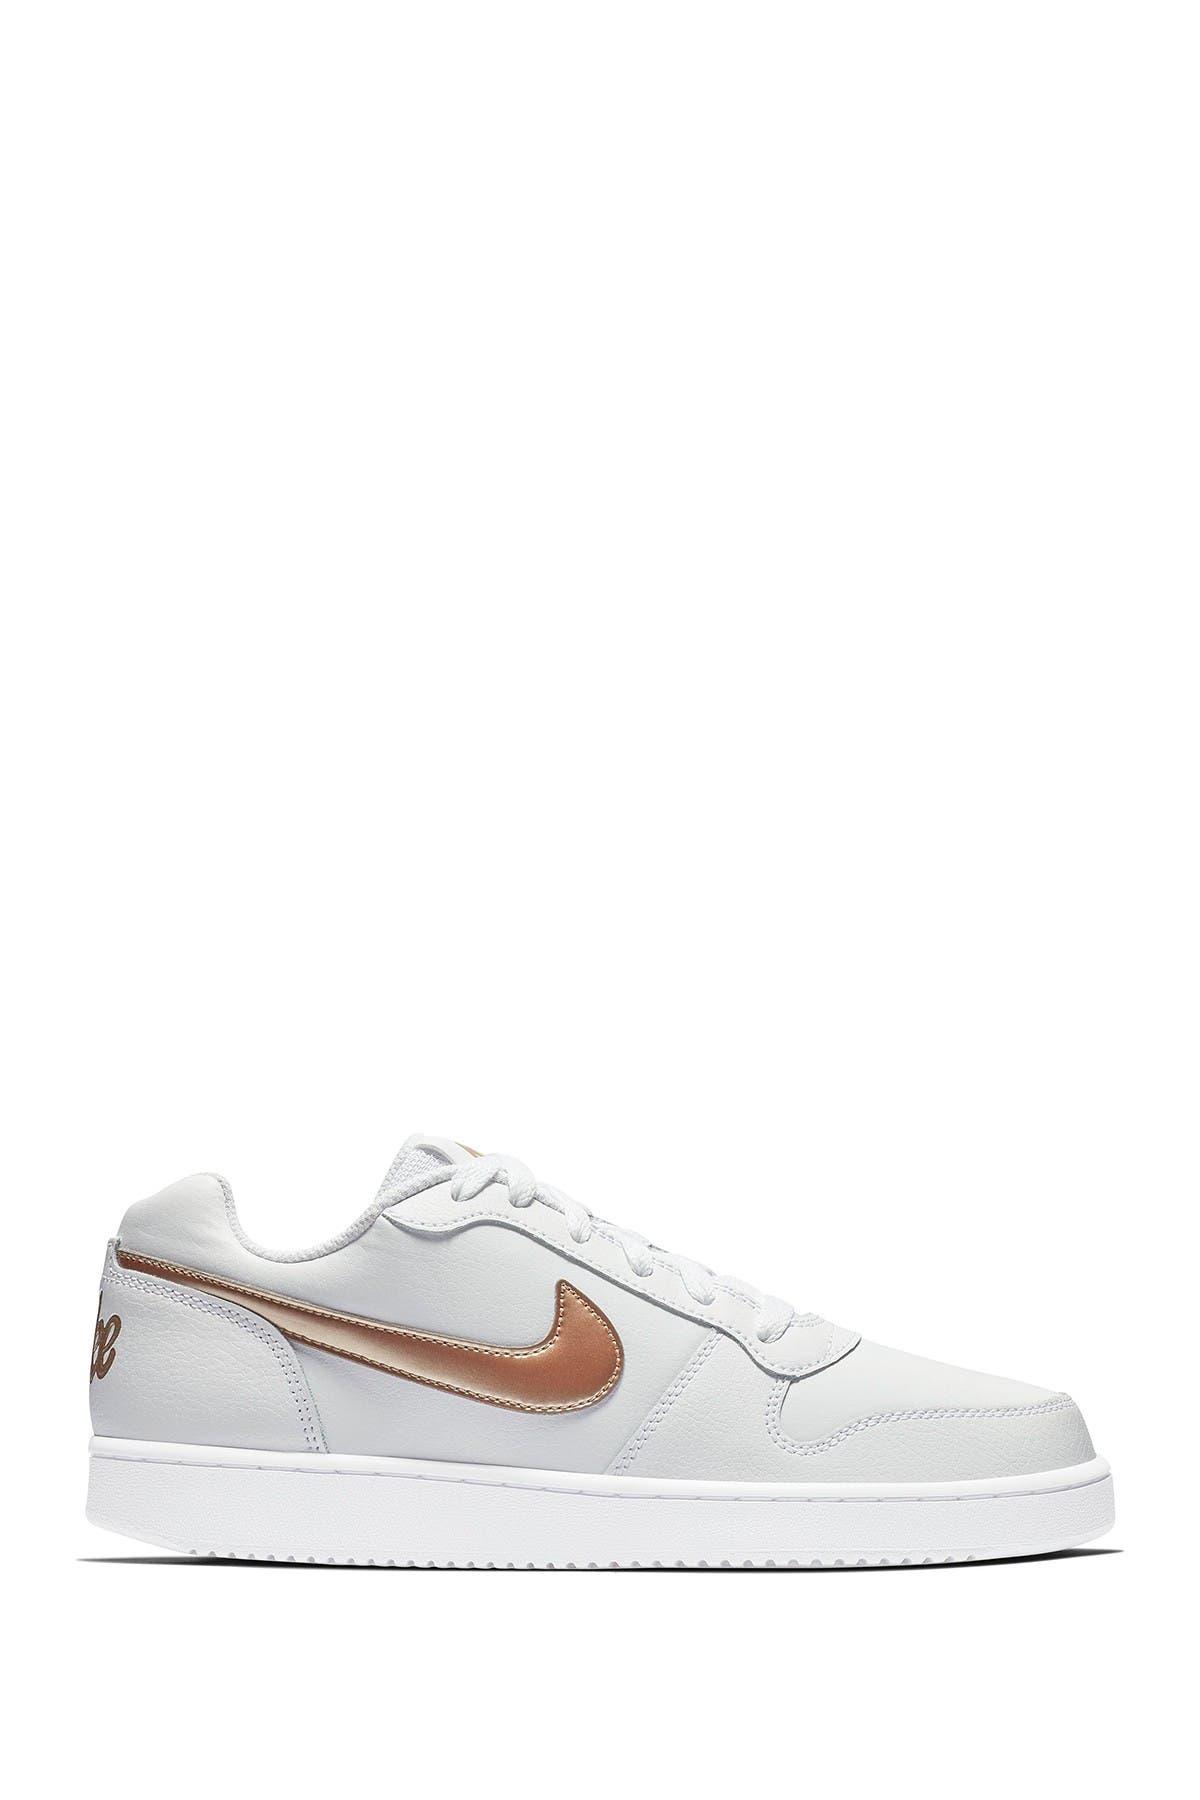 Nike   Ebernon Low Sneaker   Nordstrom Rack